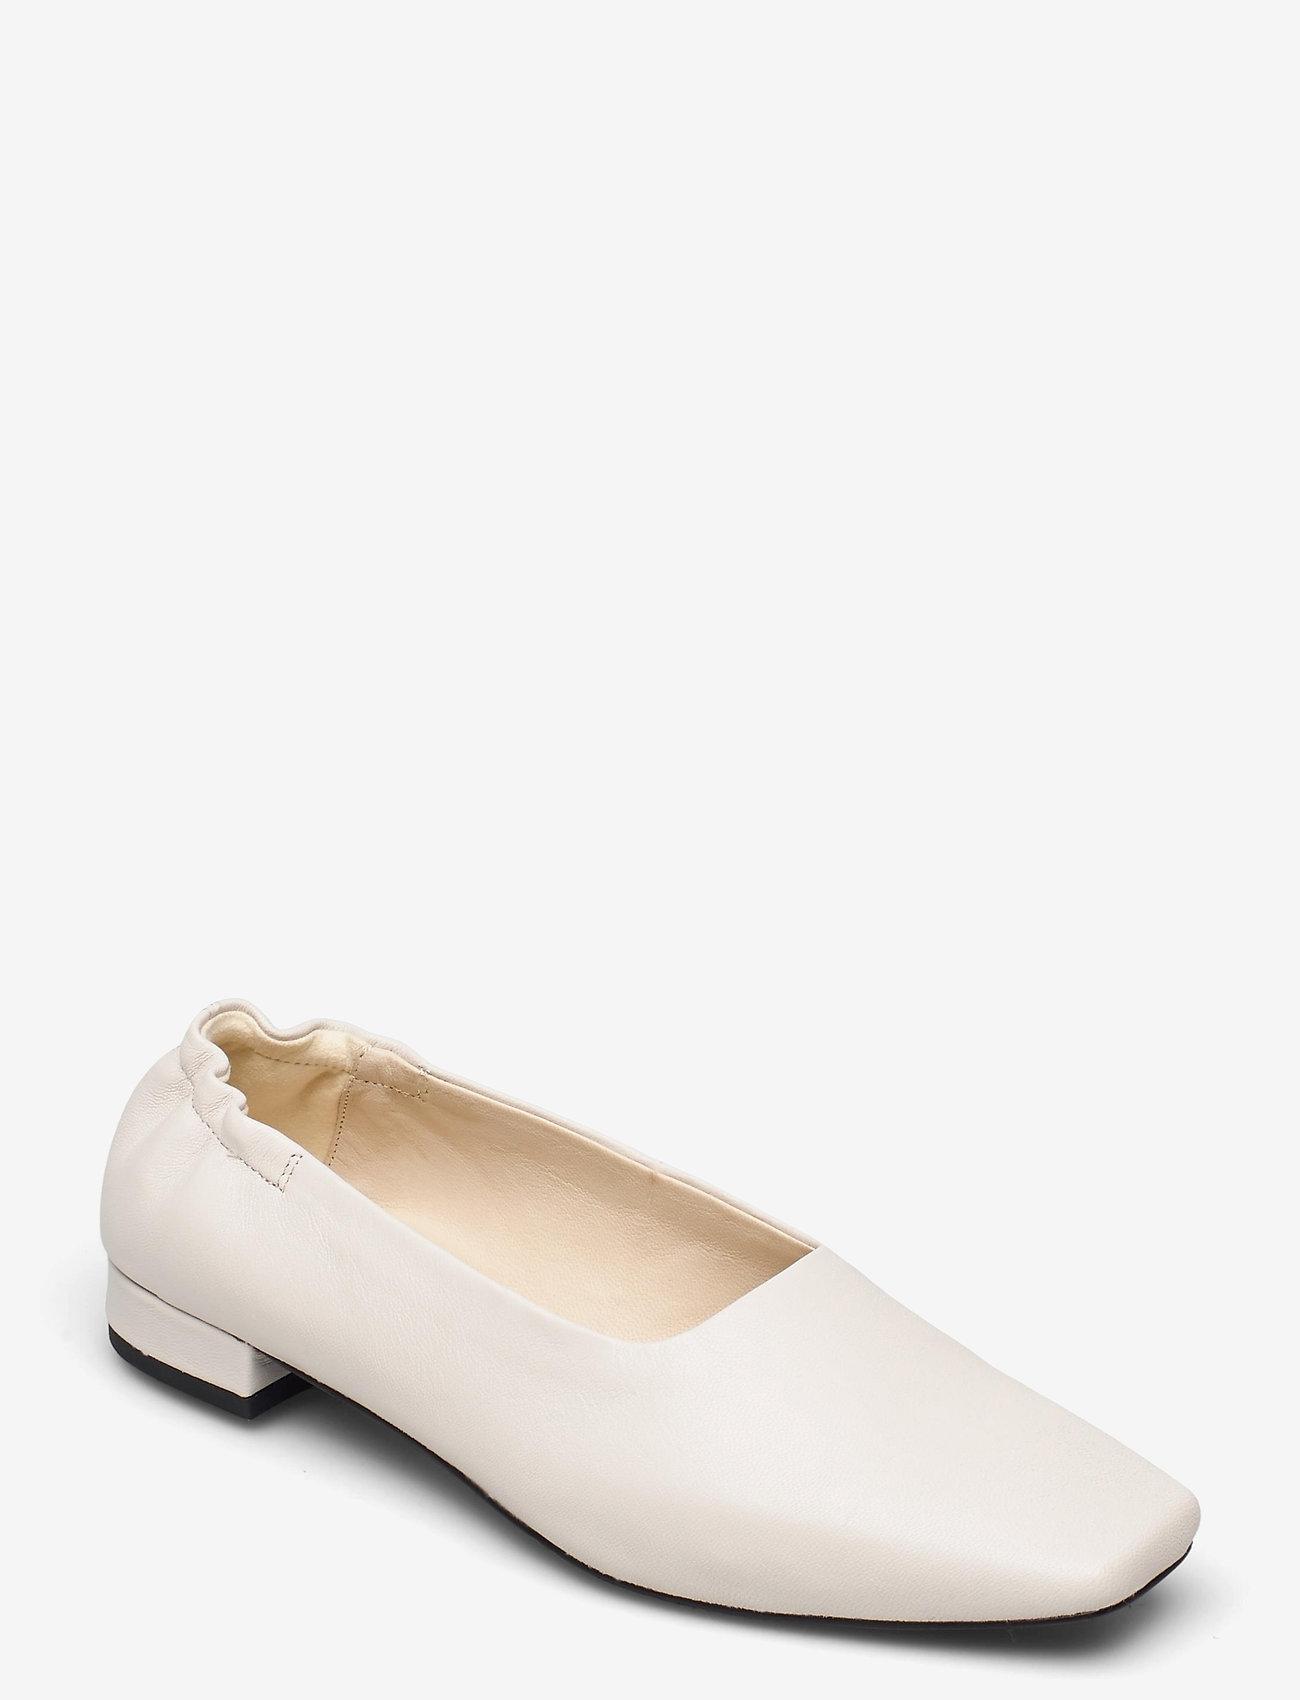 VAGABOND - LAYLA - ballerinas - off white - 0